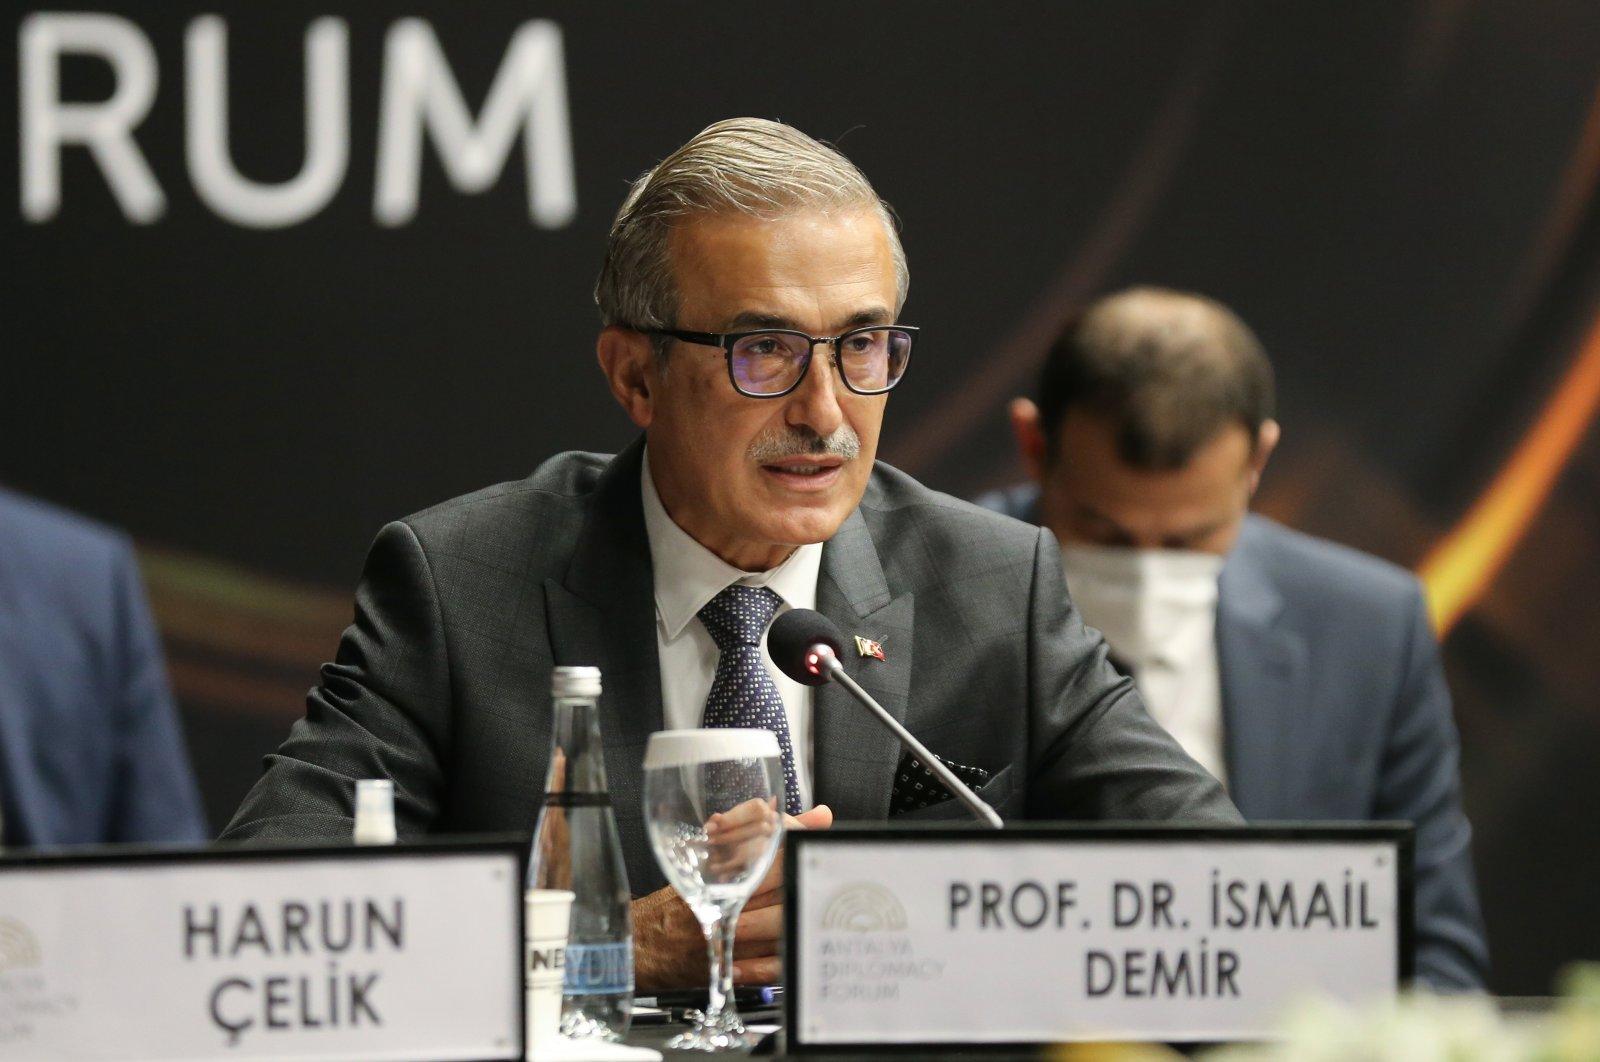 Presidency of Defense Industries (SSB) Chairperson Ismail Demir speaking at the Antalya Diplomacy Forum in Antalya, southern Turkey, June 19, 2021. (AA Photo)